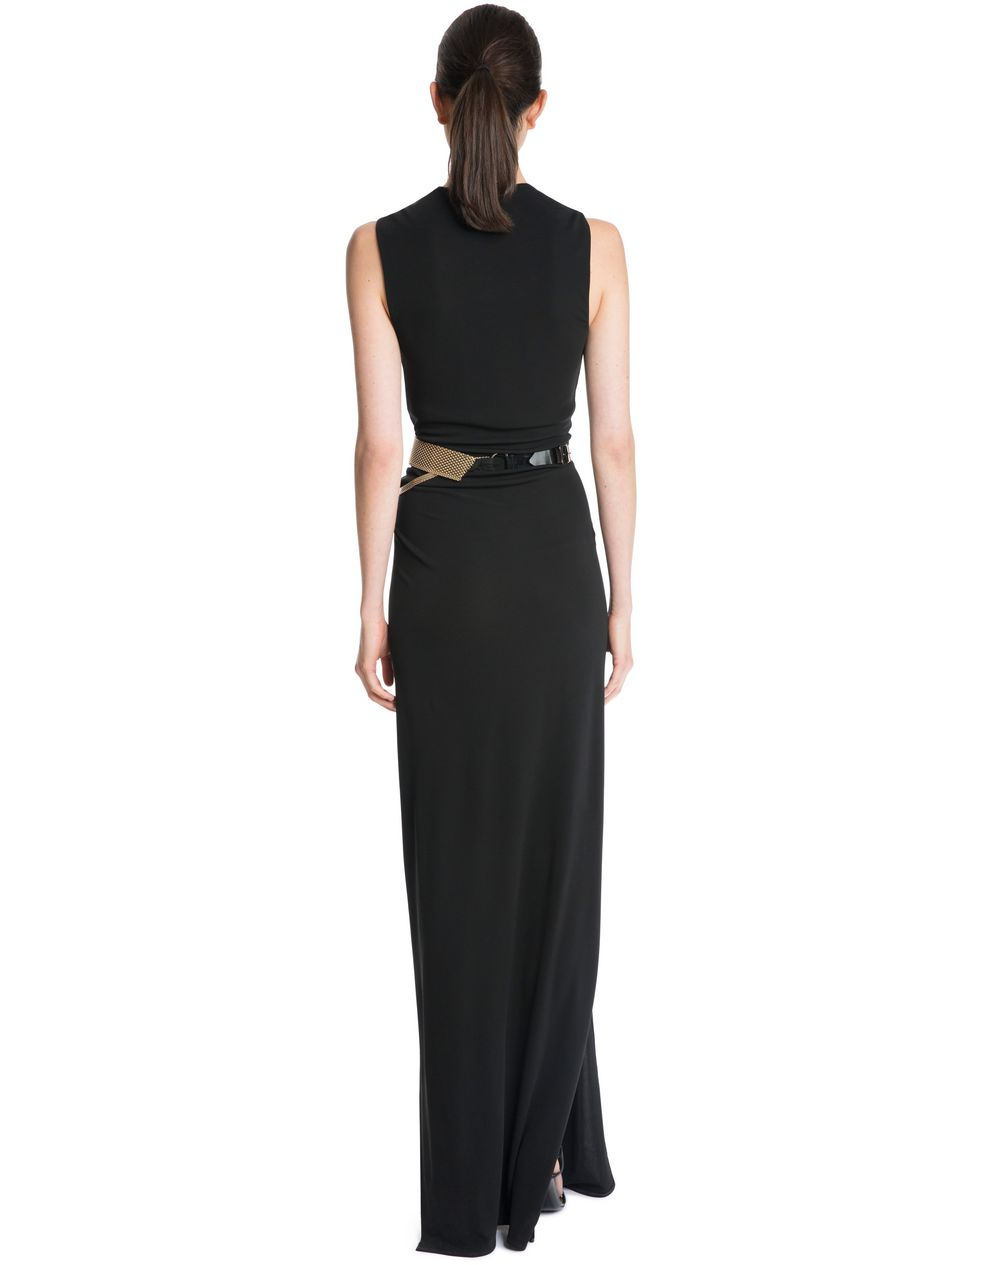 LONG CREPE JERSEY DRESS - Lanvin